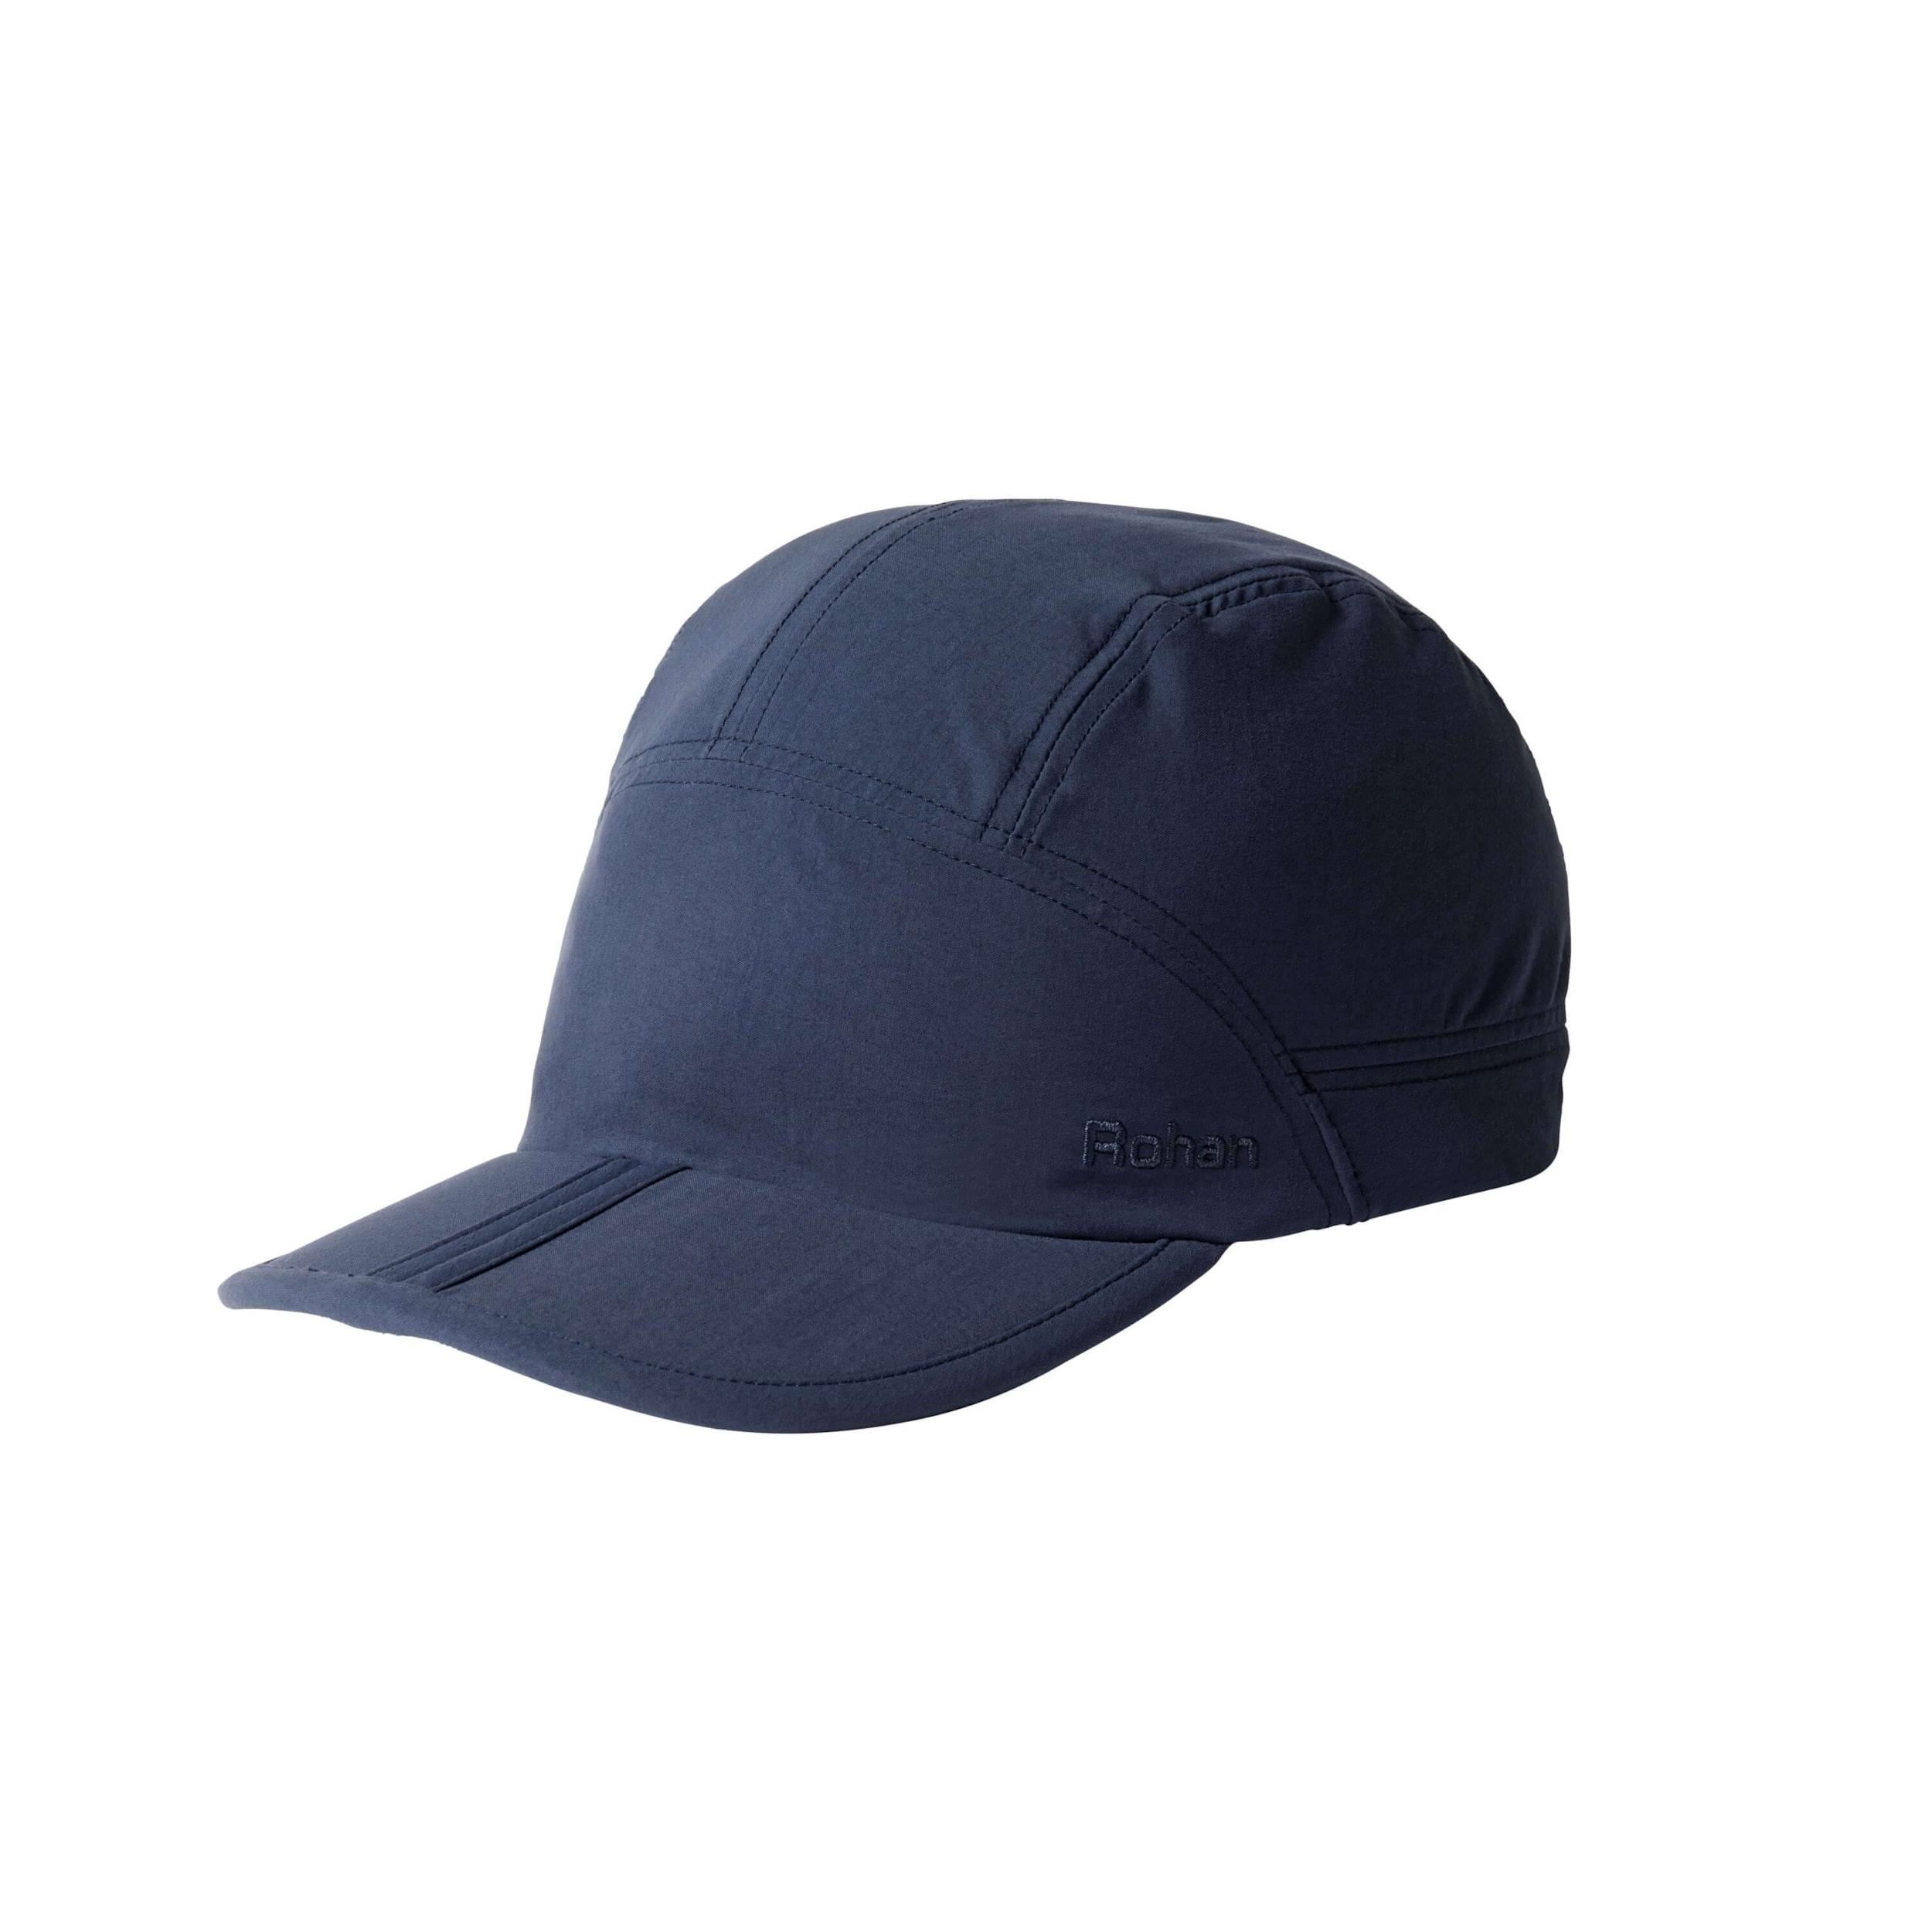 fadf332f Escaper Cap - Versatile, foldable trekking cap.